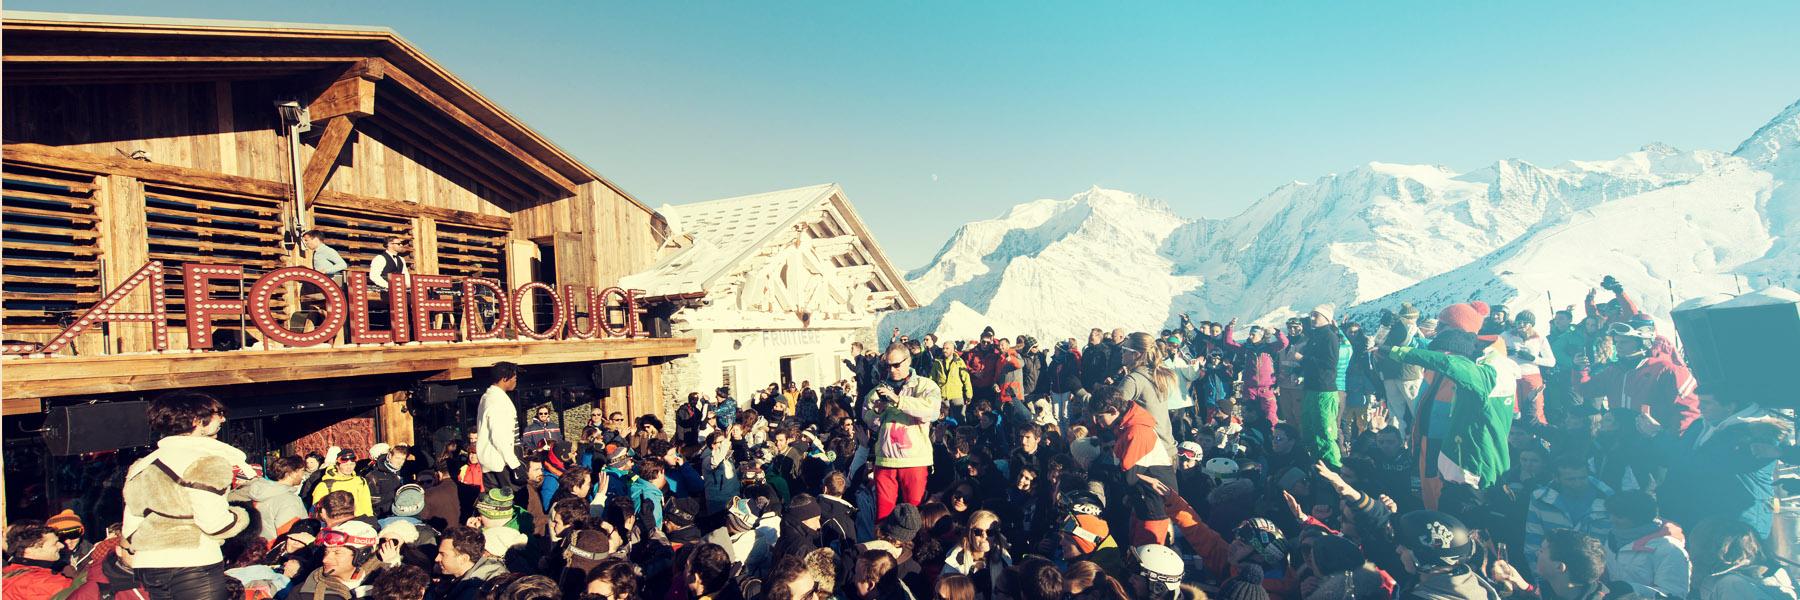 skihomepages_0008_Turquoise Haze